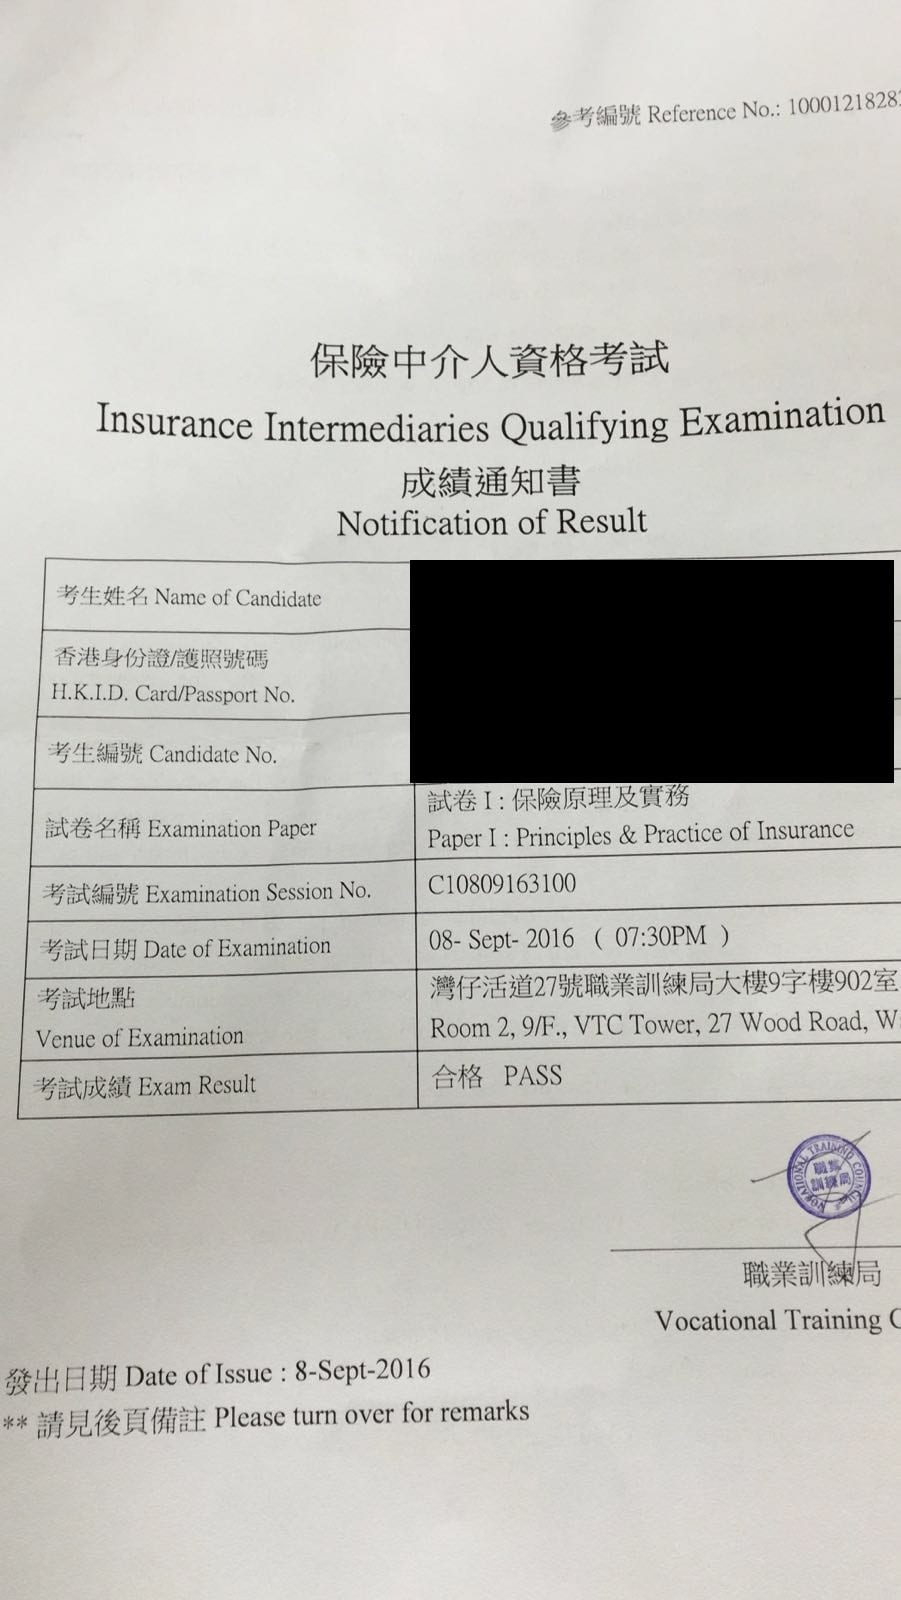 LZK 9/9/2016 IIQE Paper 1 保險中介人資格考試卷一 Pass